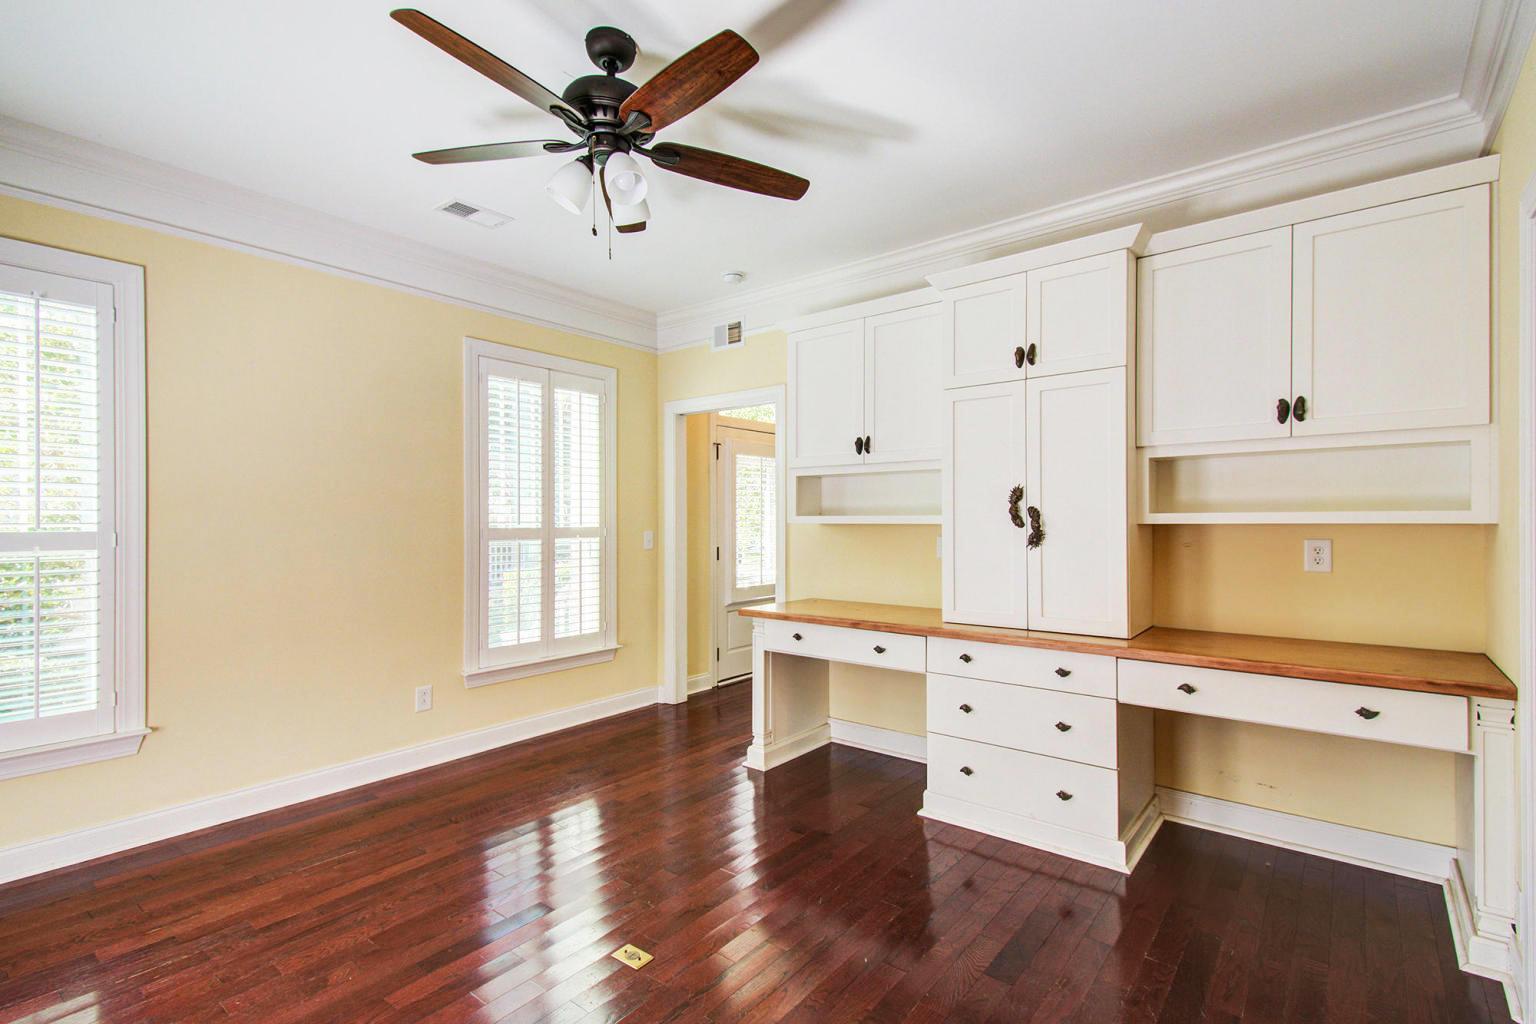 Center Park Homes For Sale - 950 Crossing, Daniel Island, SC - 52